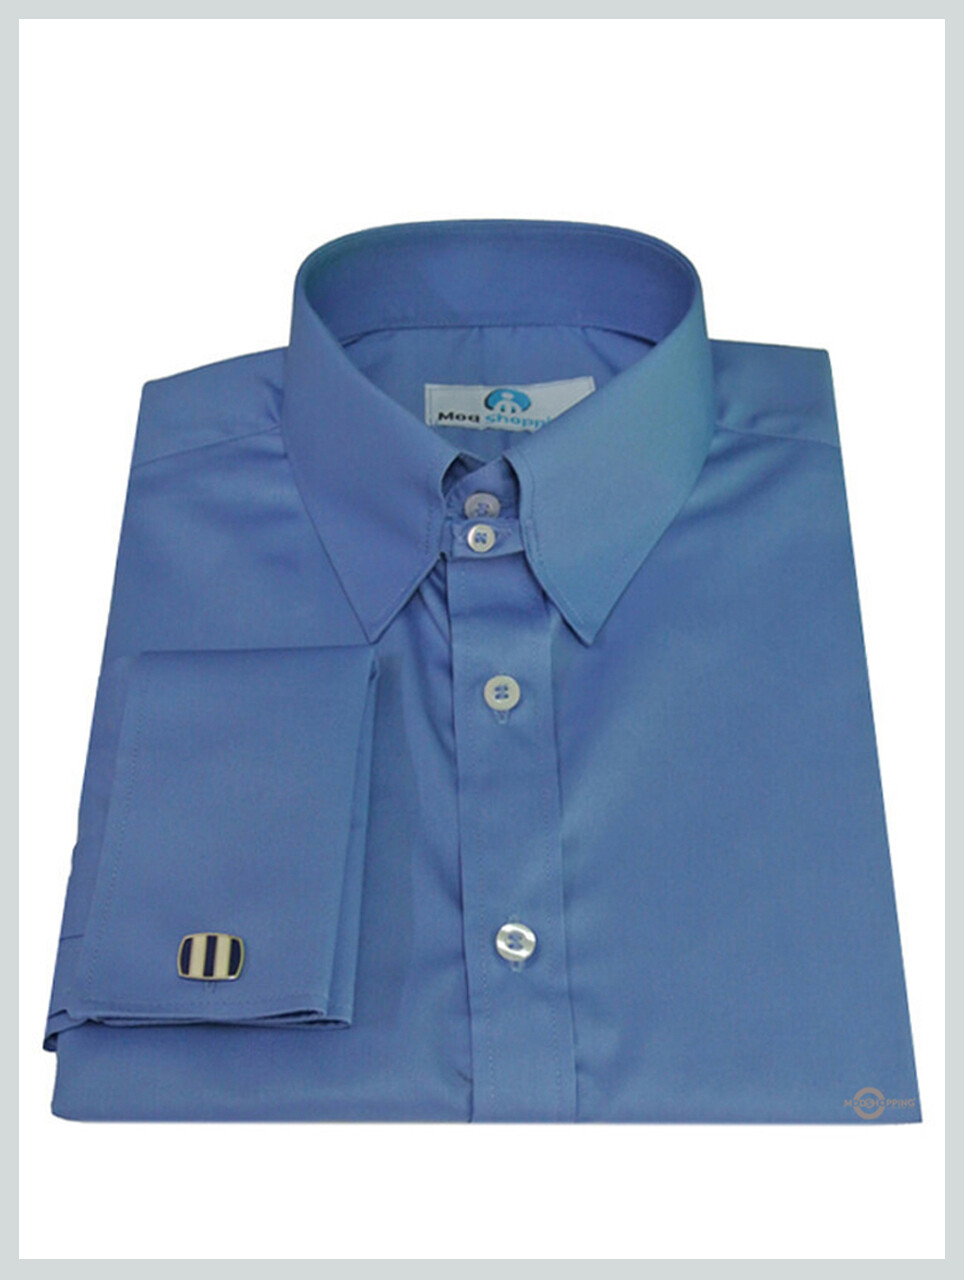 Tab Collar Shirt| Long Sleeve Sky Blue Tab Collar Shirt